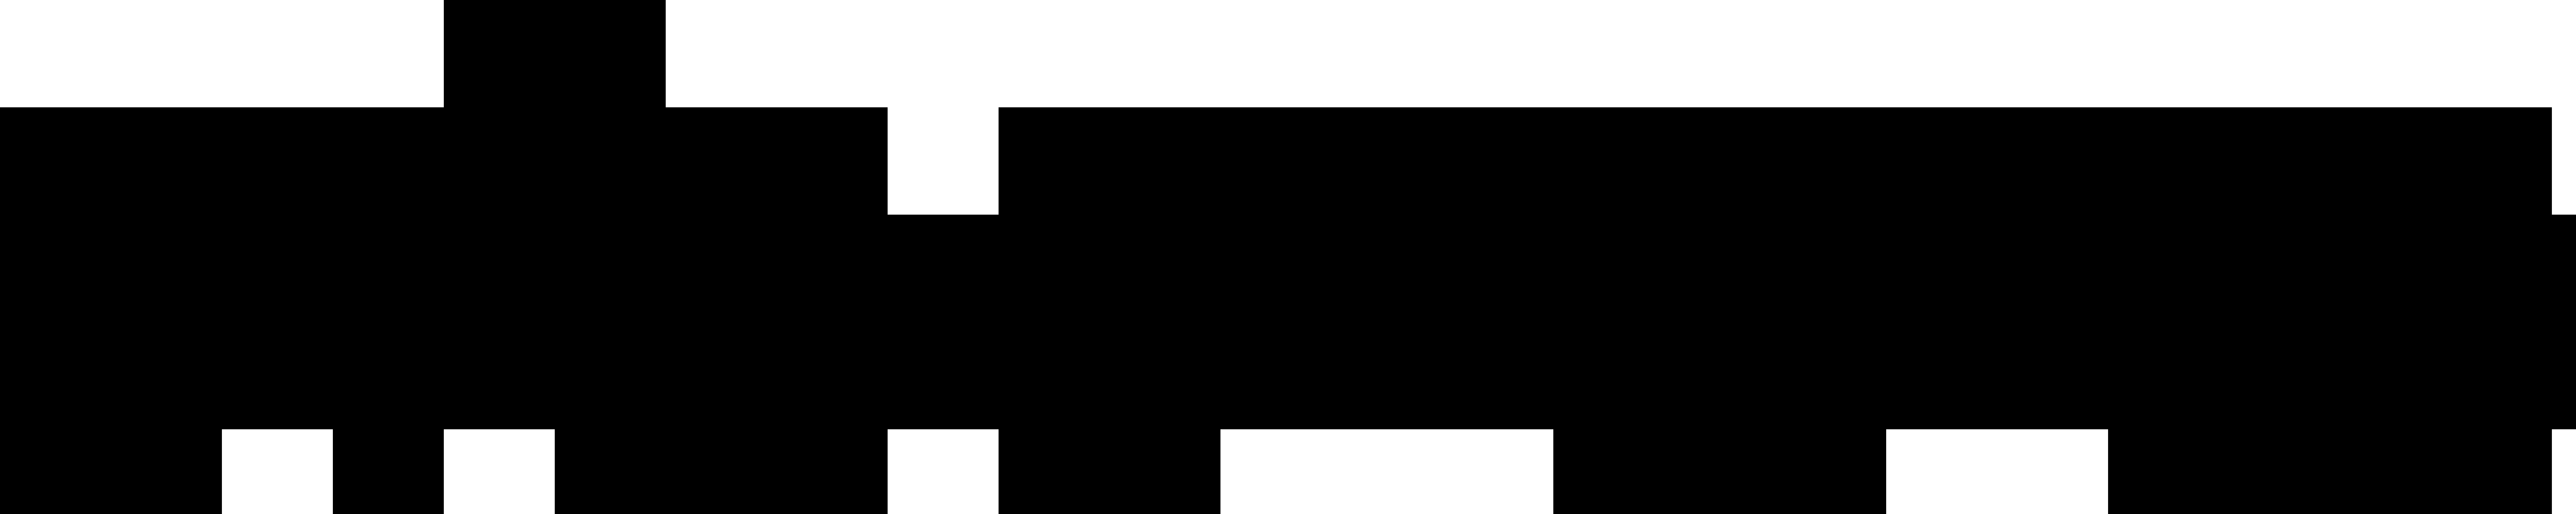 adtech_black